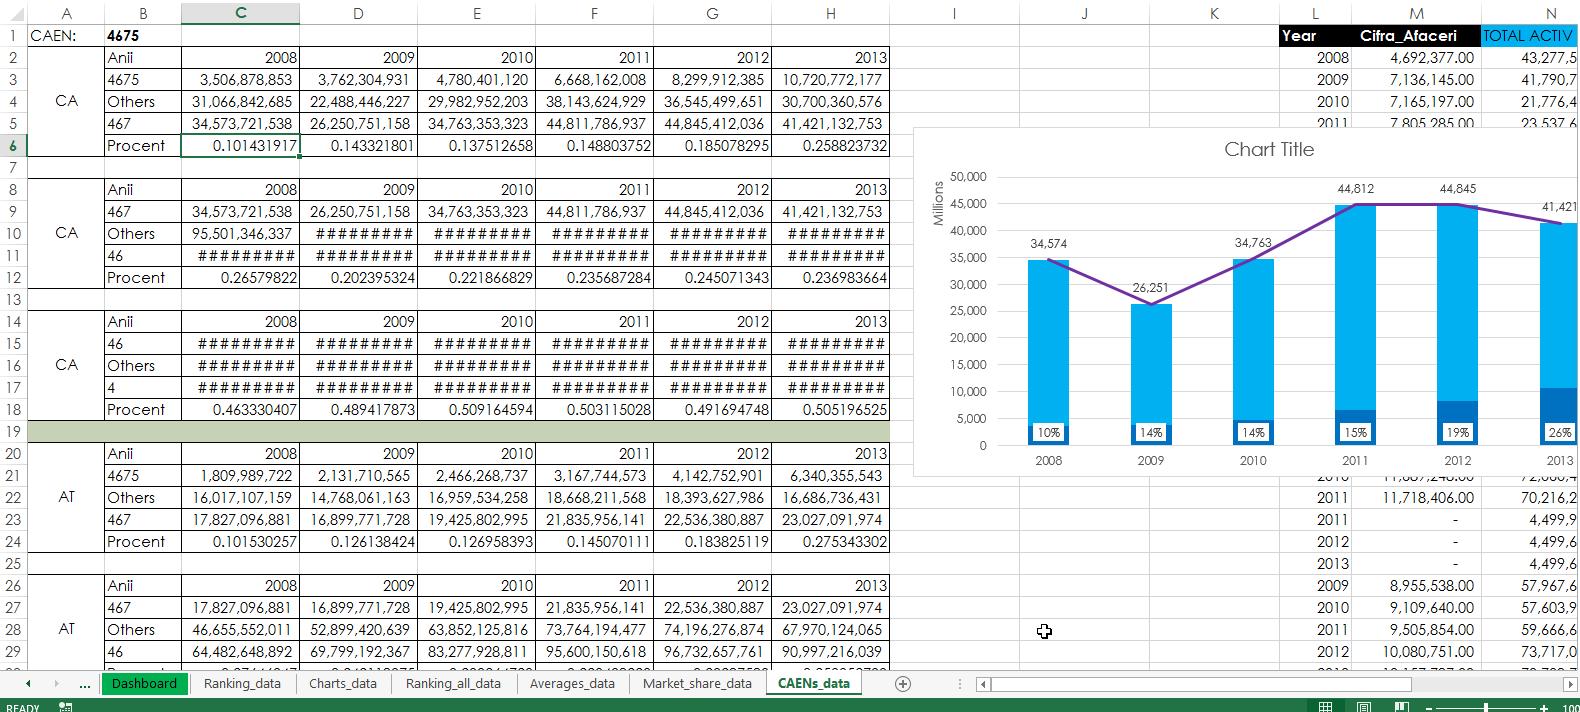 5. CAENs Data